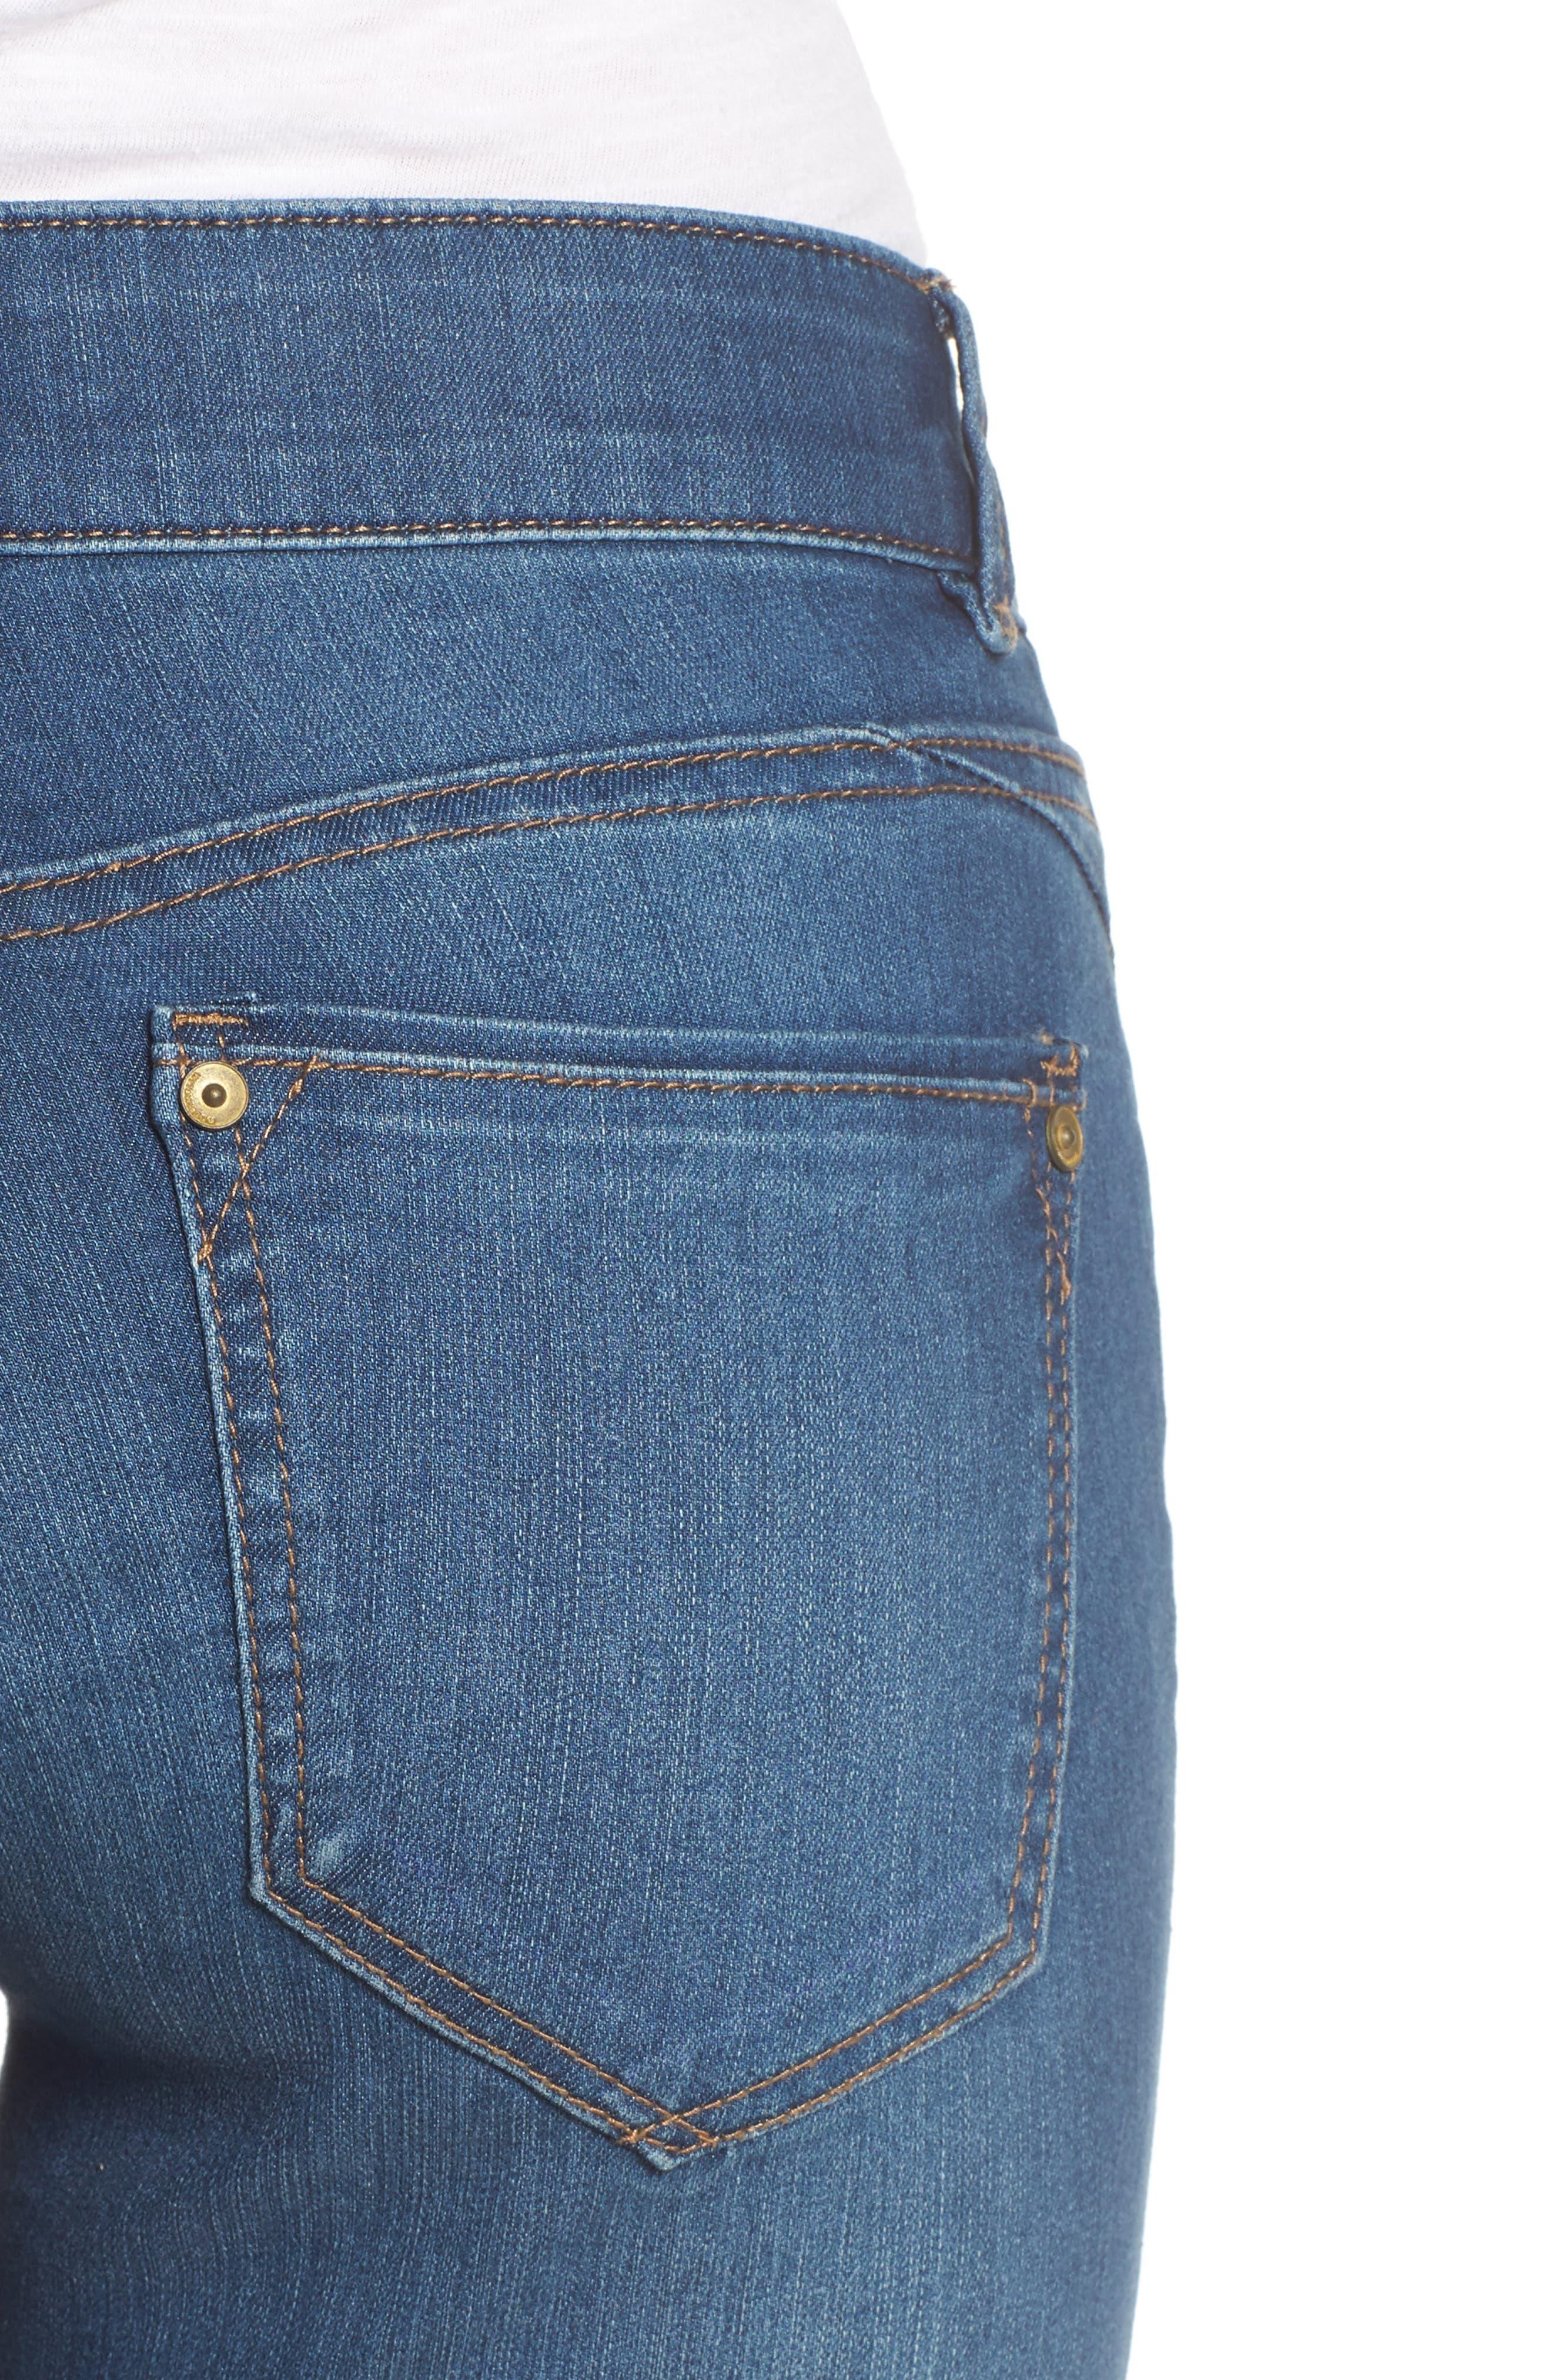 Alternate Image 4  - Wit & Wisdom Ab-solution Ankle Skimmer Jeans (Nordstrom Exclusive)